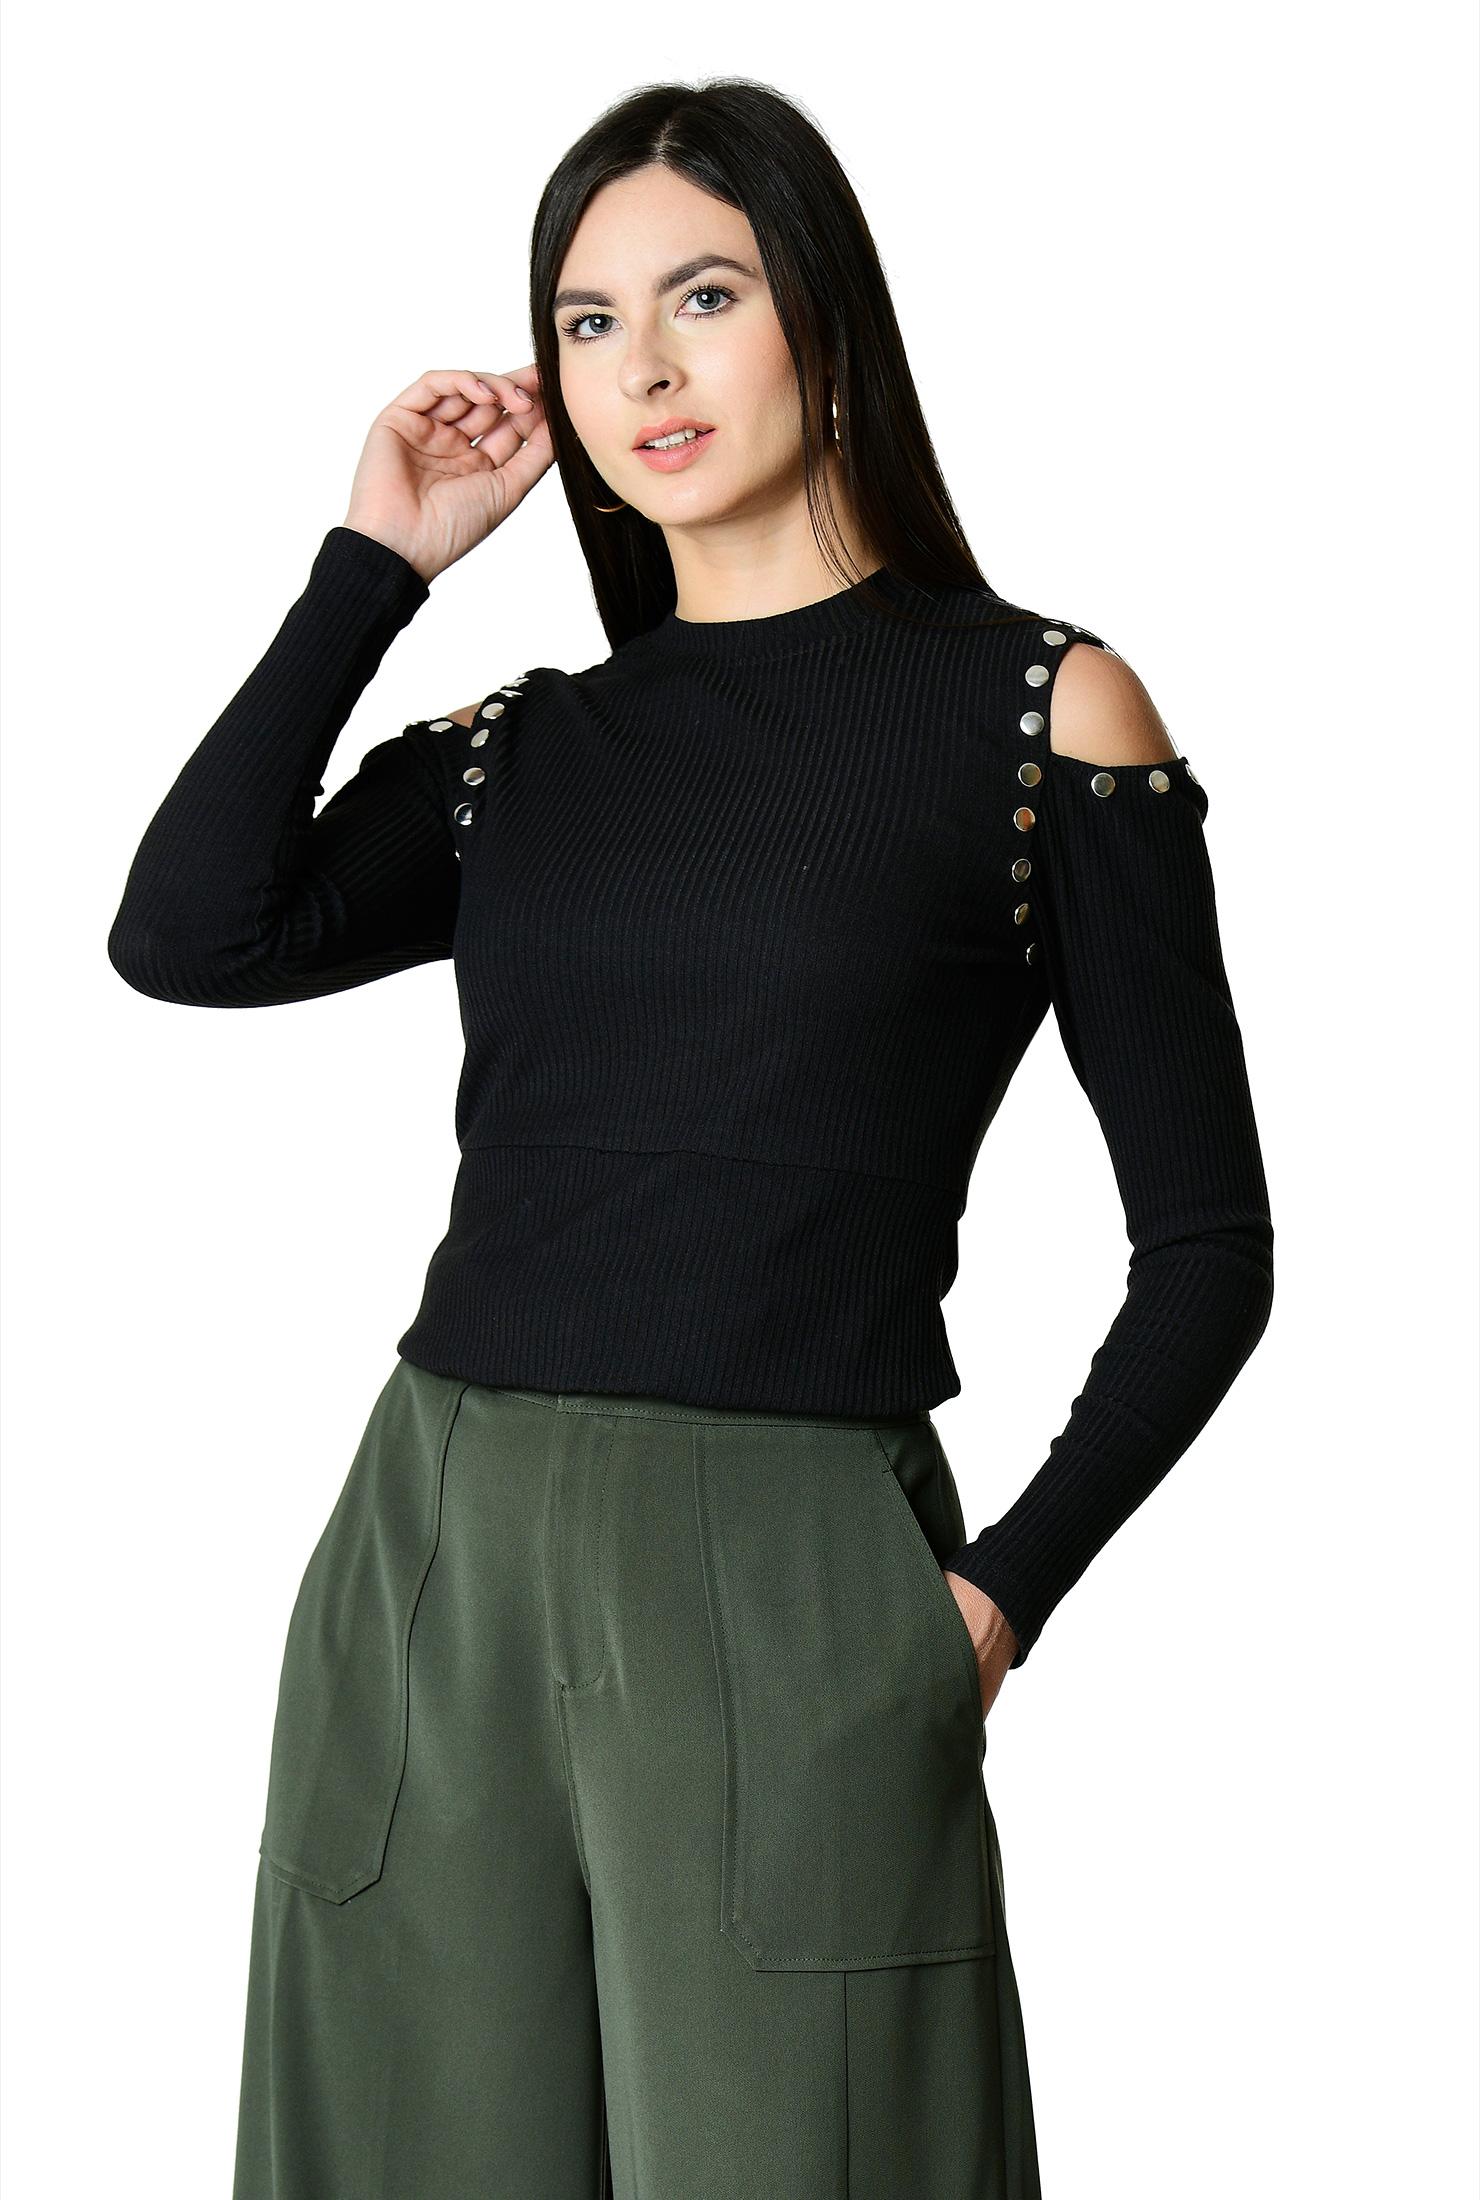 5381081909729 Women s Fashion Clothing 0-36W and Custom